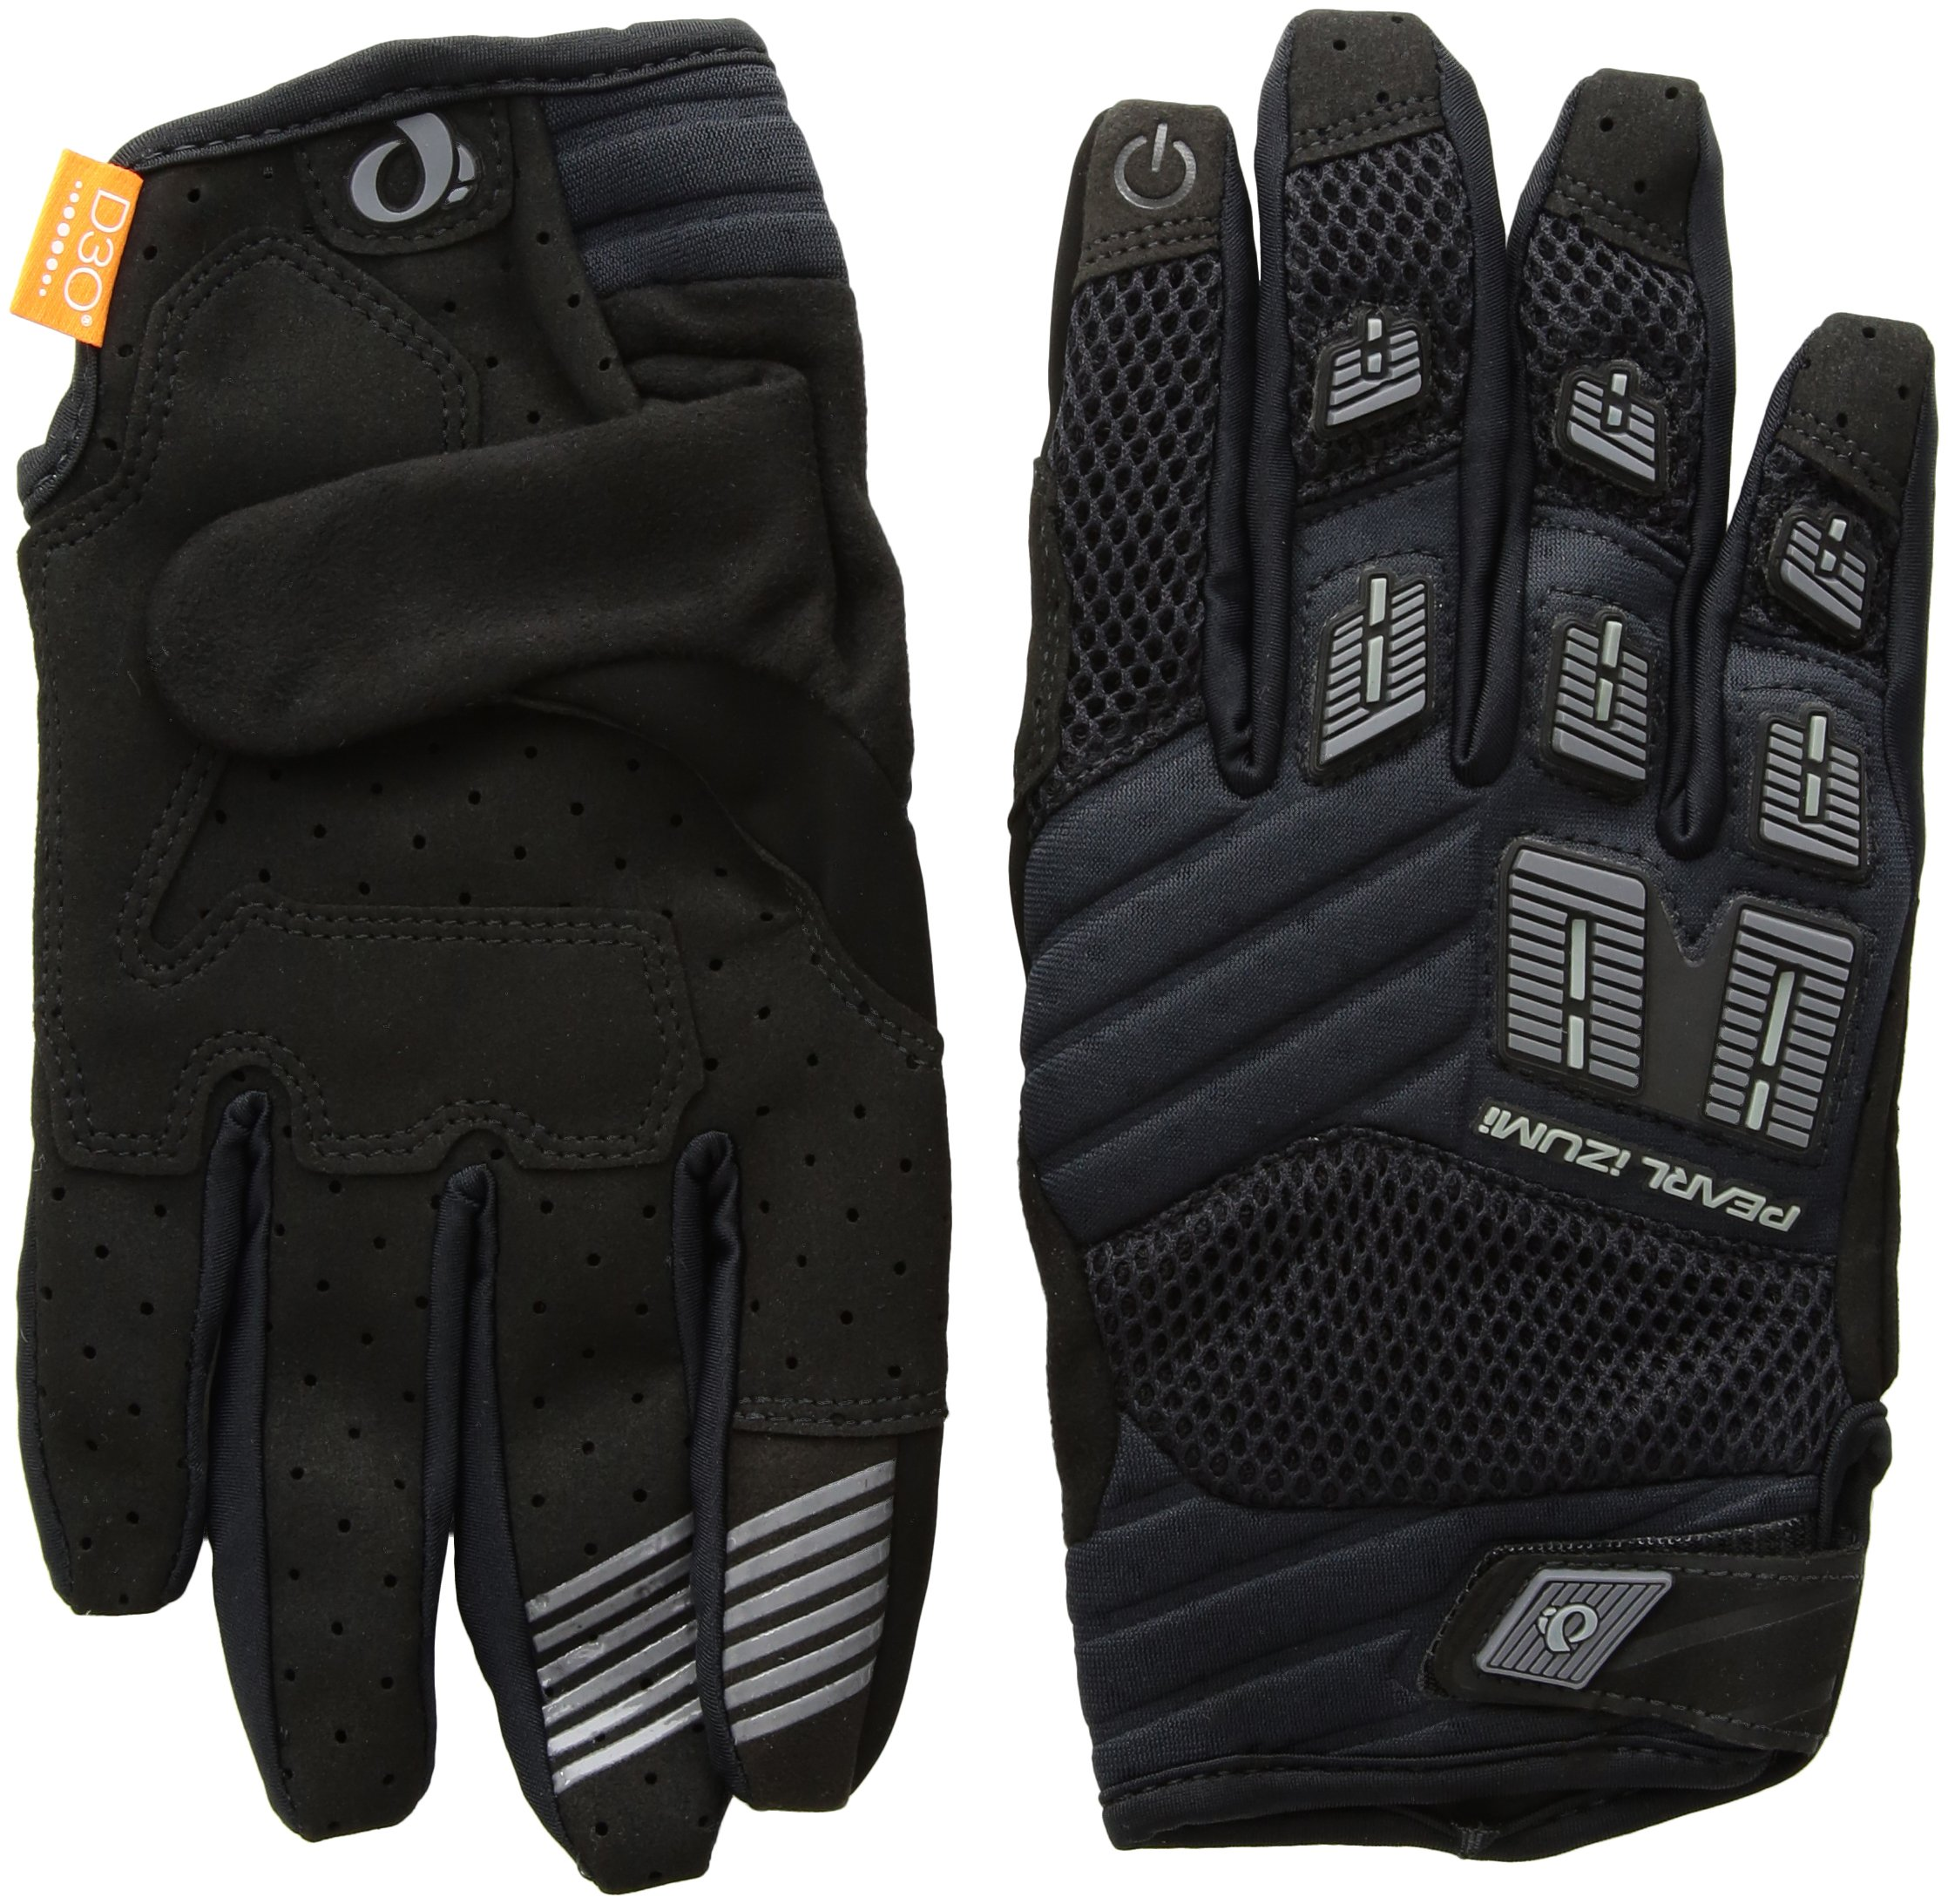 Pearl iZUMi Launch Glove, Black, XX-Large by Pearl iZUMi